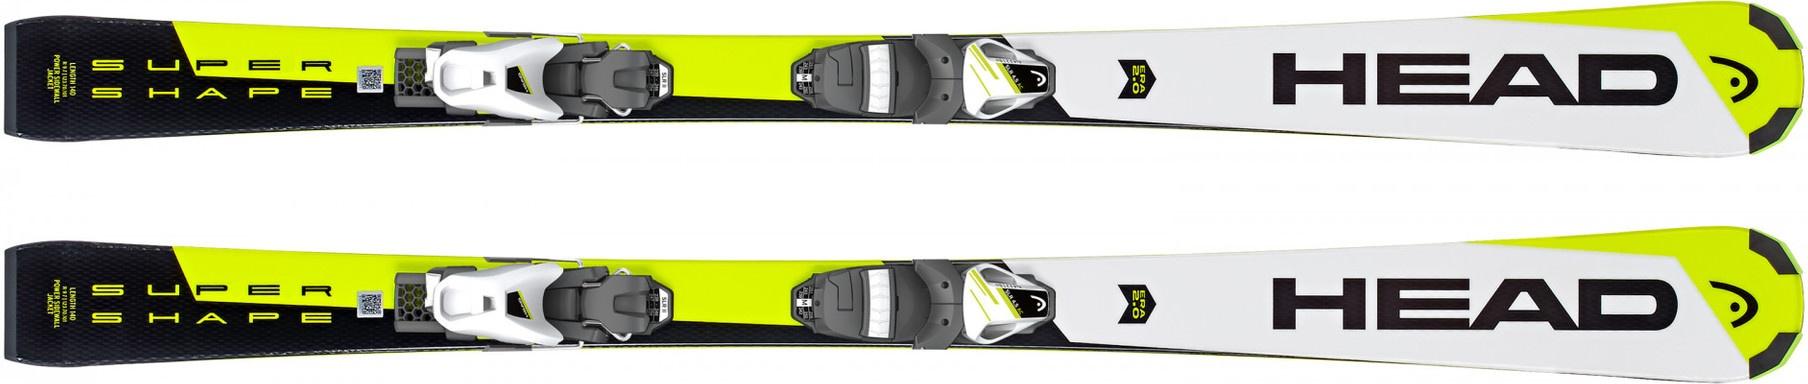 Горные лыжи Head Supershape SLR 2 White/Neon/Yellow + SLR 7.5 AC 2019, 120 см фото